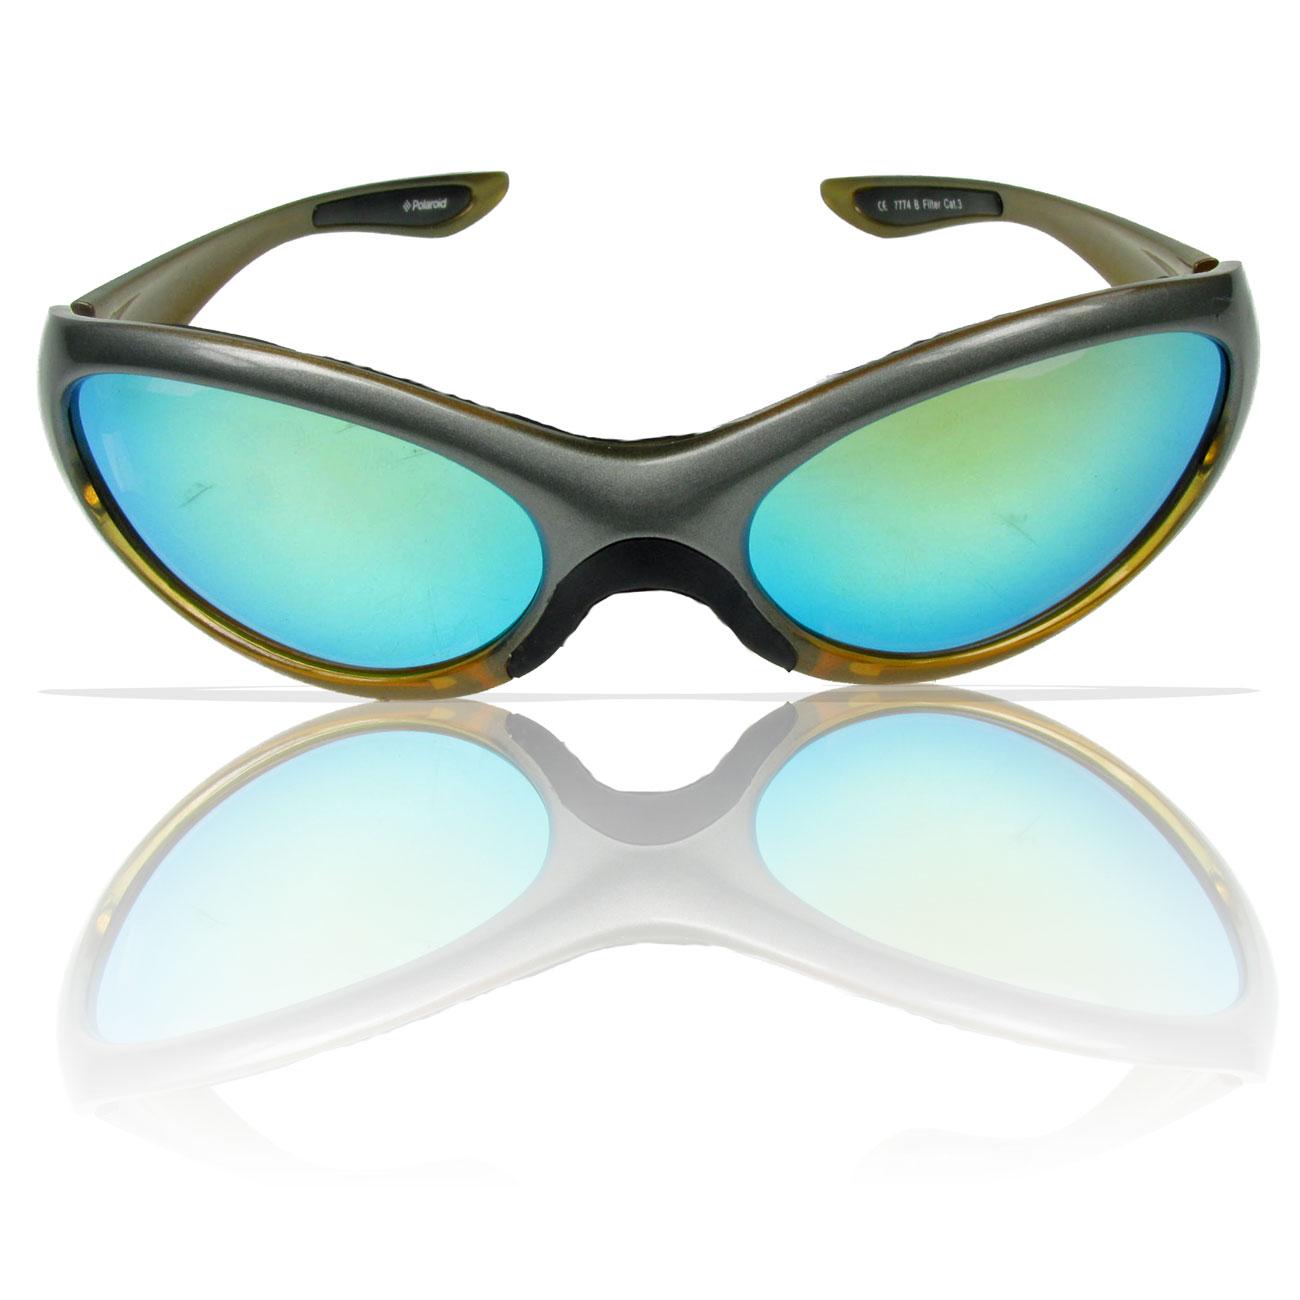 d7f8a85c03ee polaroid sunglasses. Ladies Sunglasses Polaroid Polarized Lens UV400 CAT 2  Inkognito 5712C Scratched ...